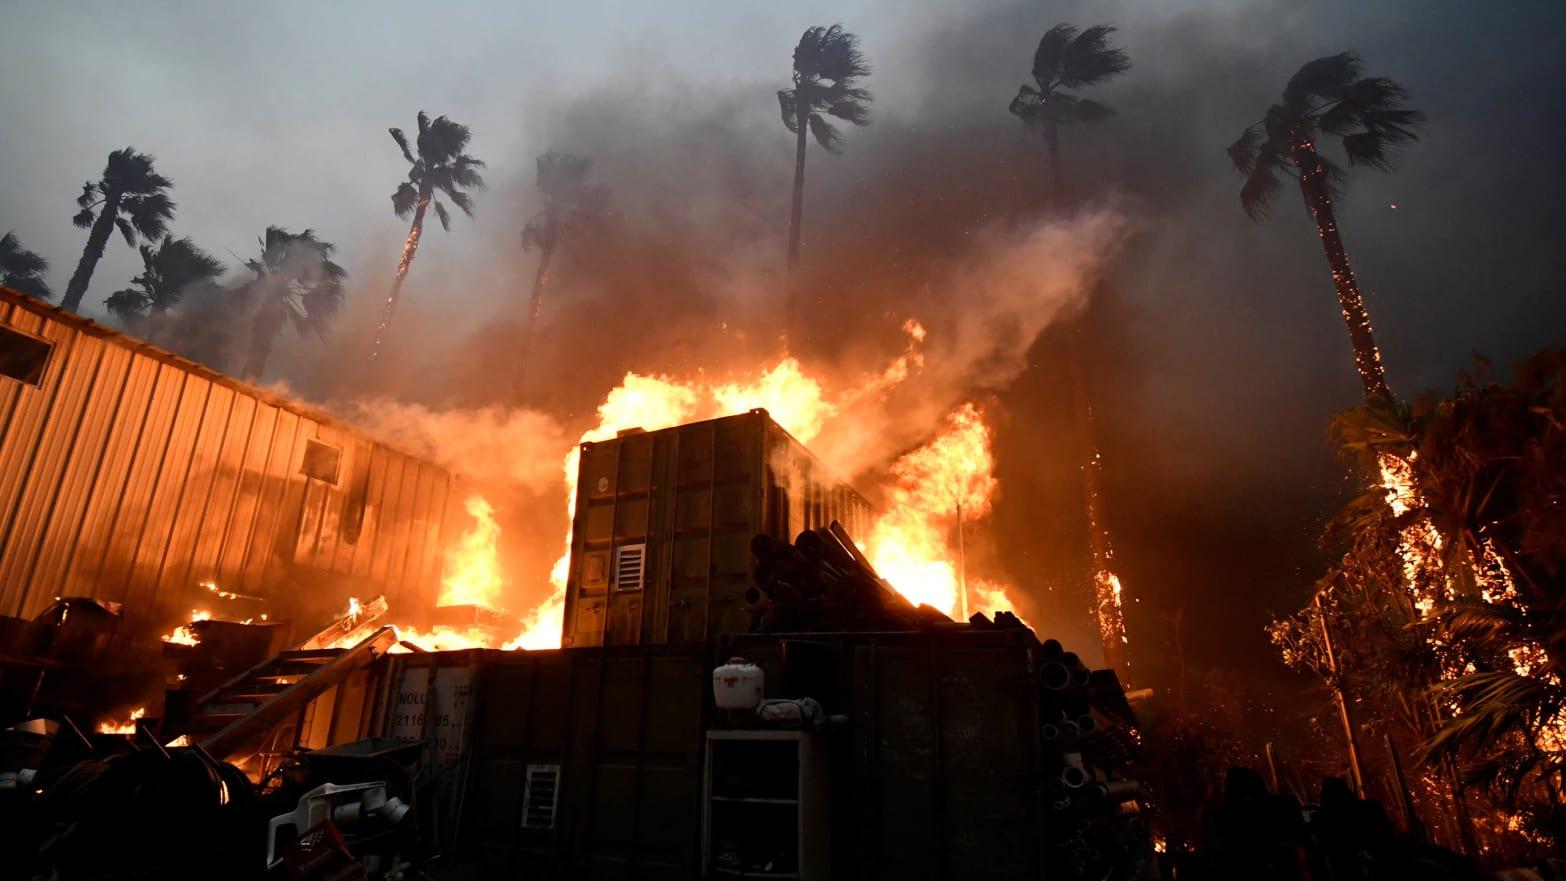 night image of woolsey fire in malibu california camp climate change global warming negative rain ron elvington meteorlogy drought